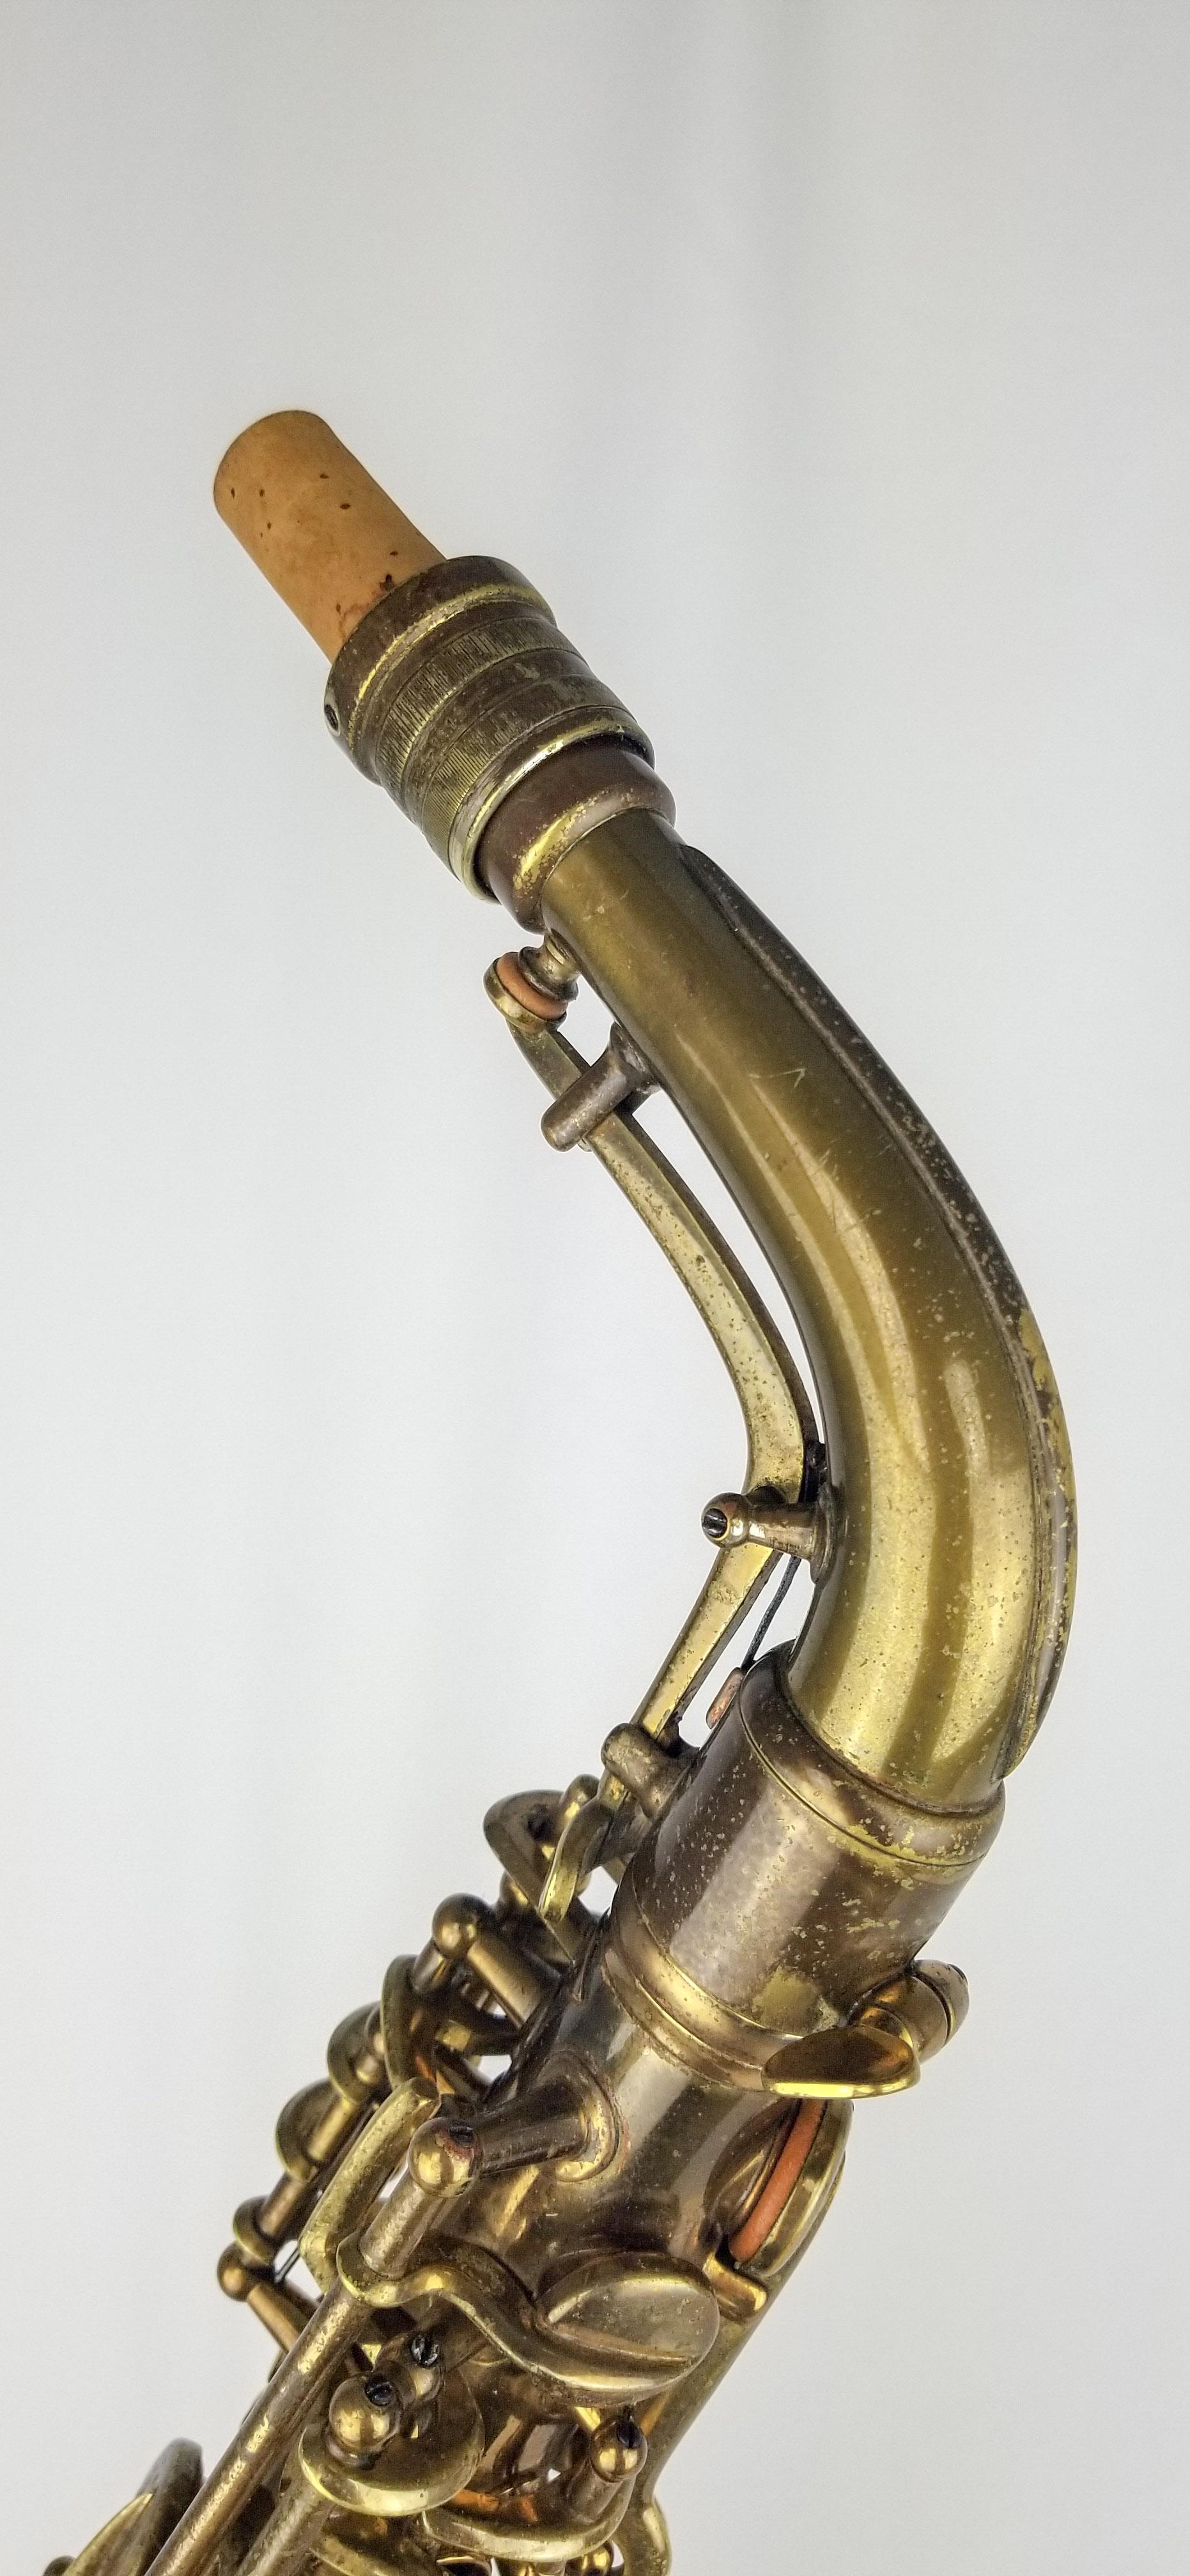 USED - Conn Transitional Alto Saxophone S#M246xxx